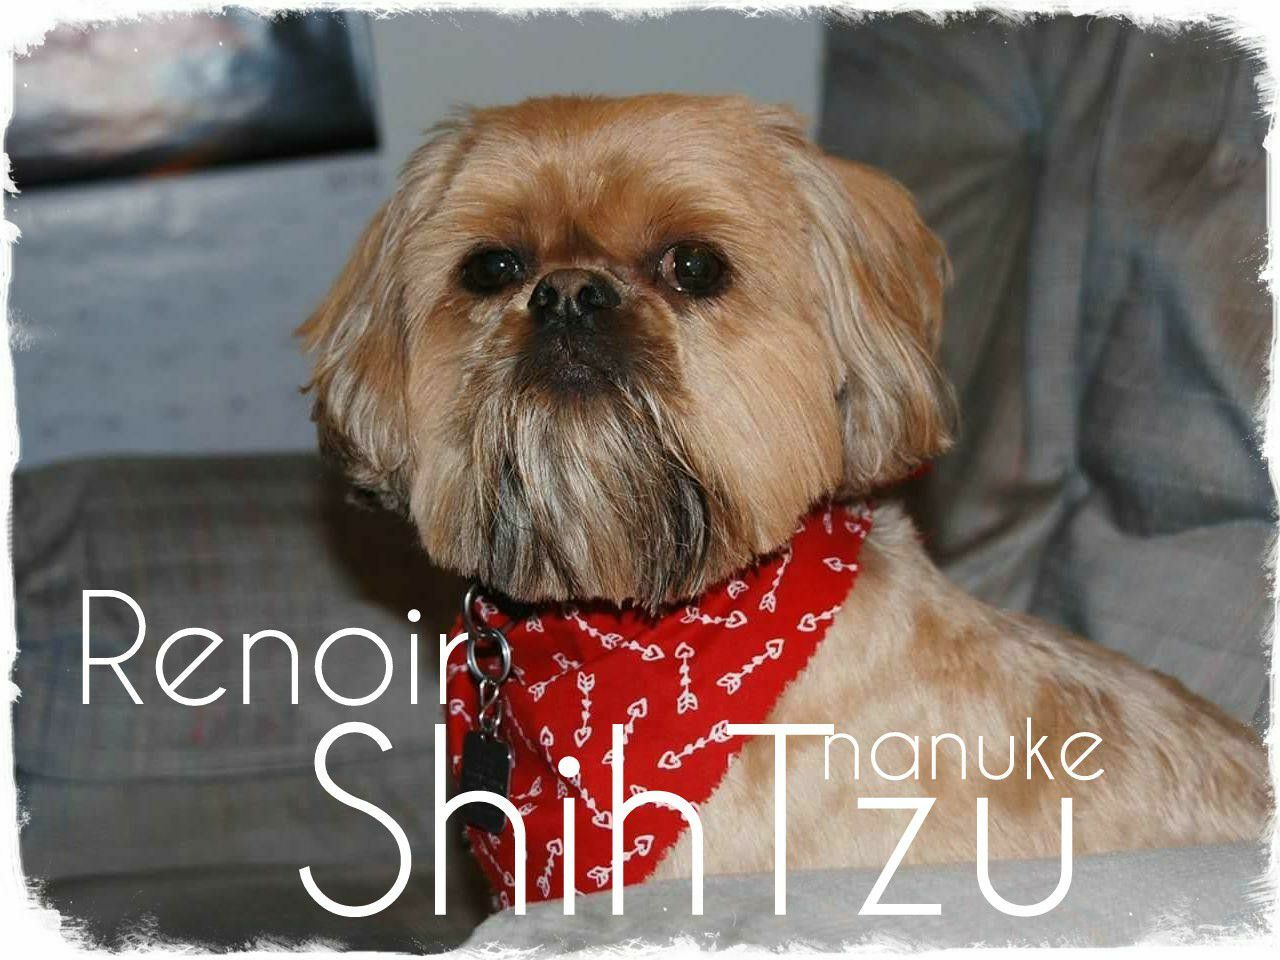 Pin by sonia pacheco on nanuke shih tzu owners club shih